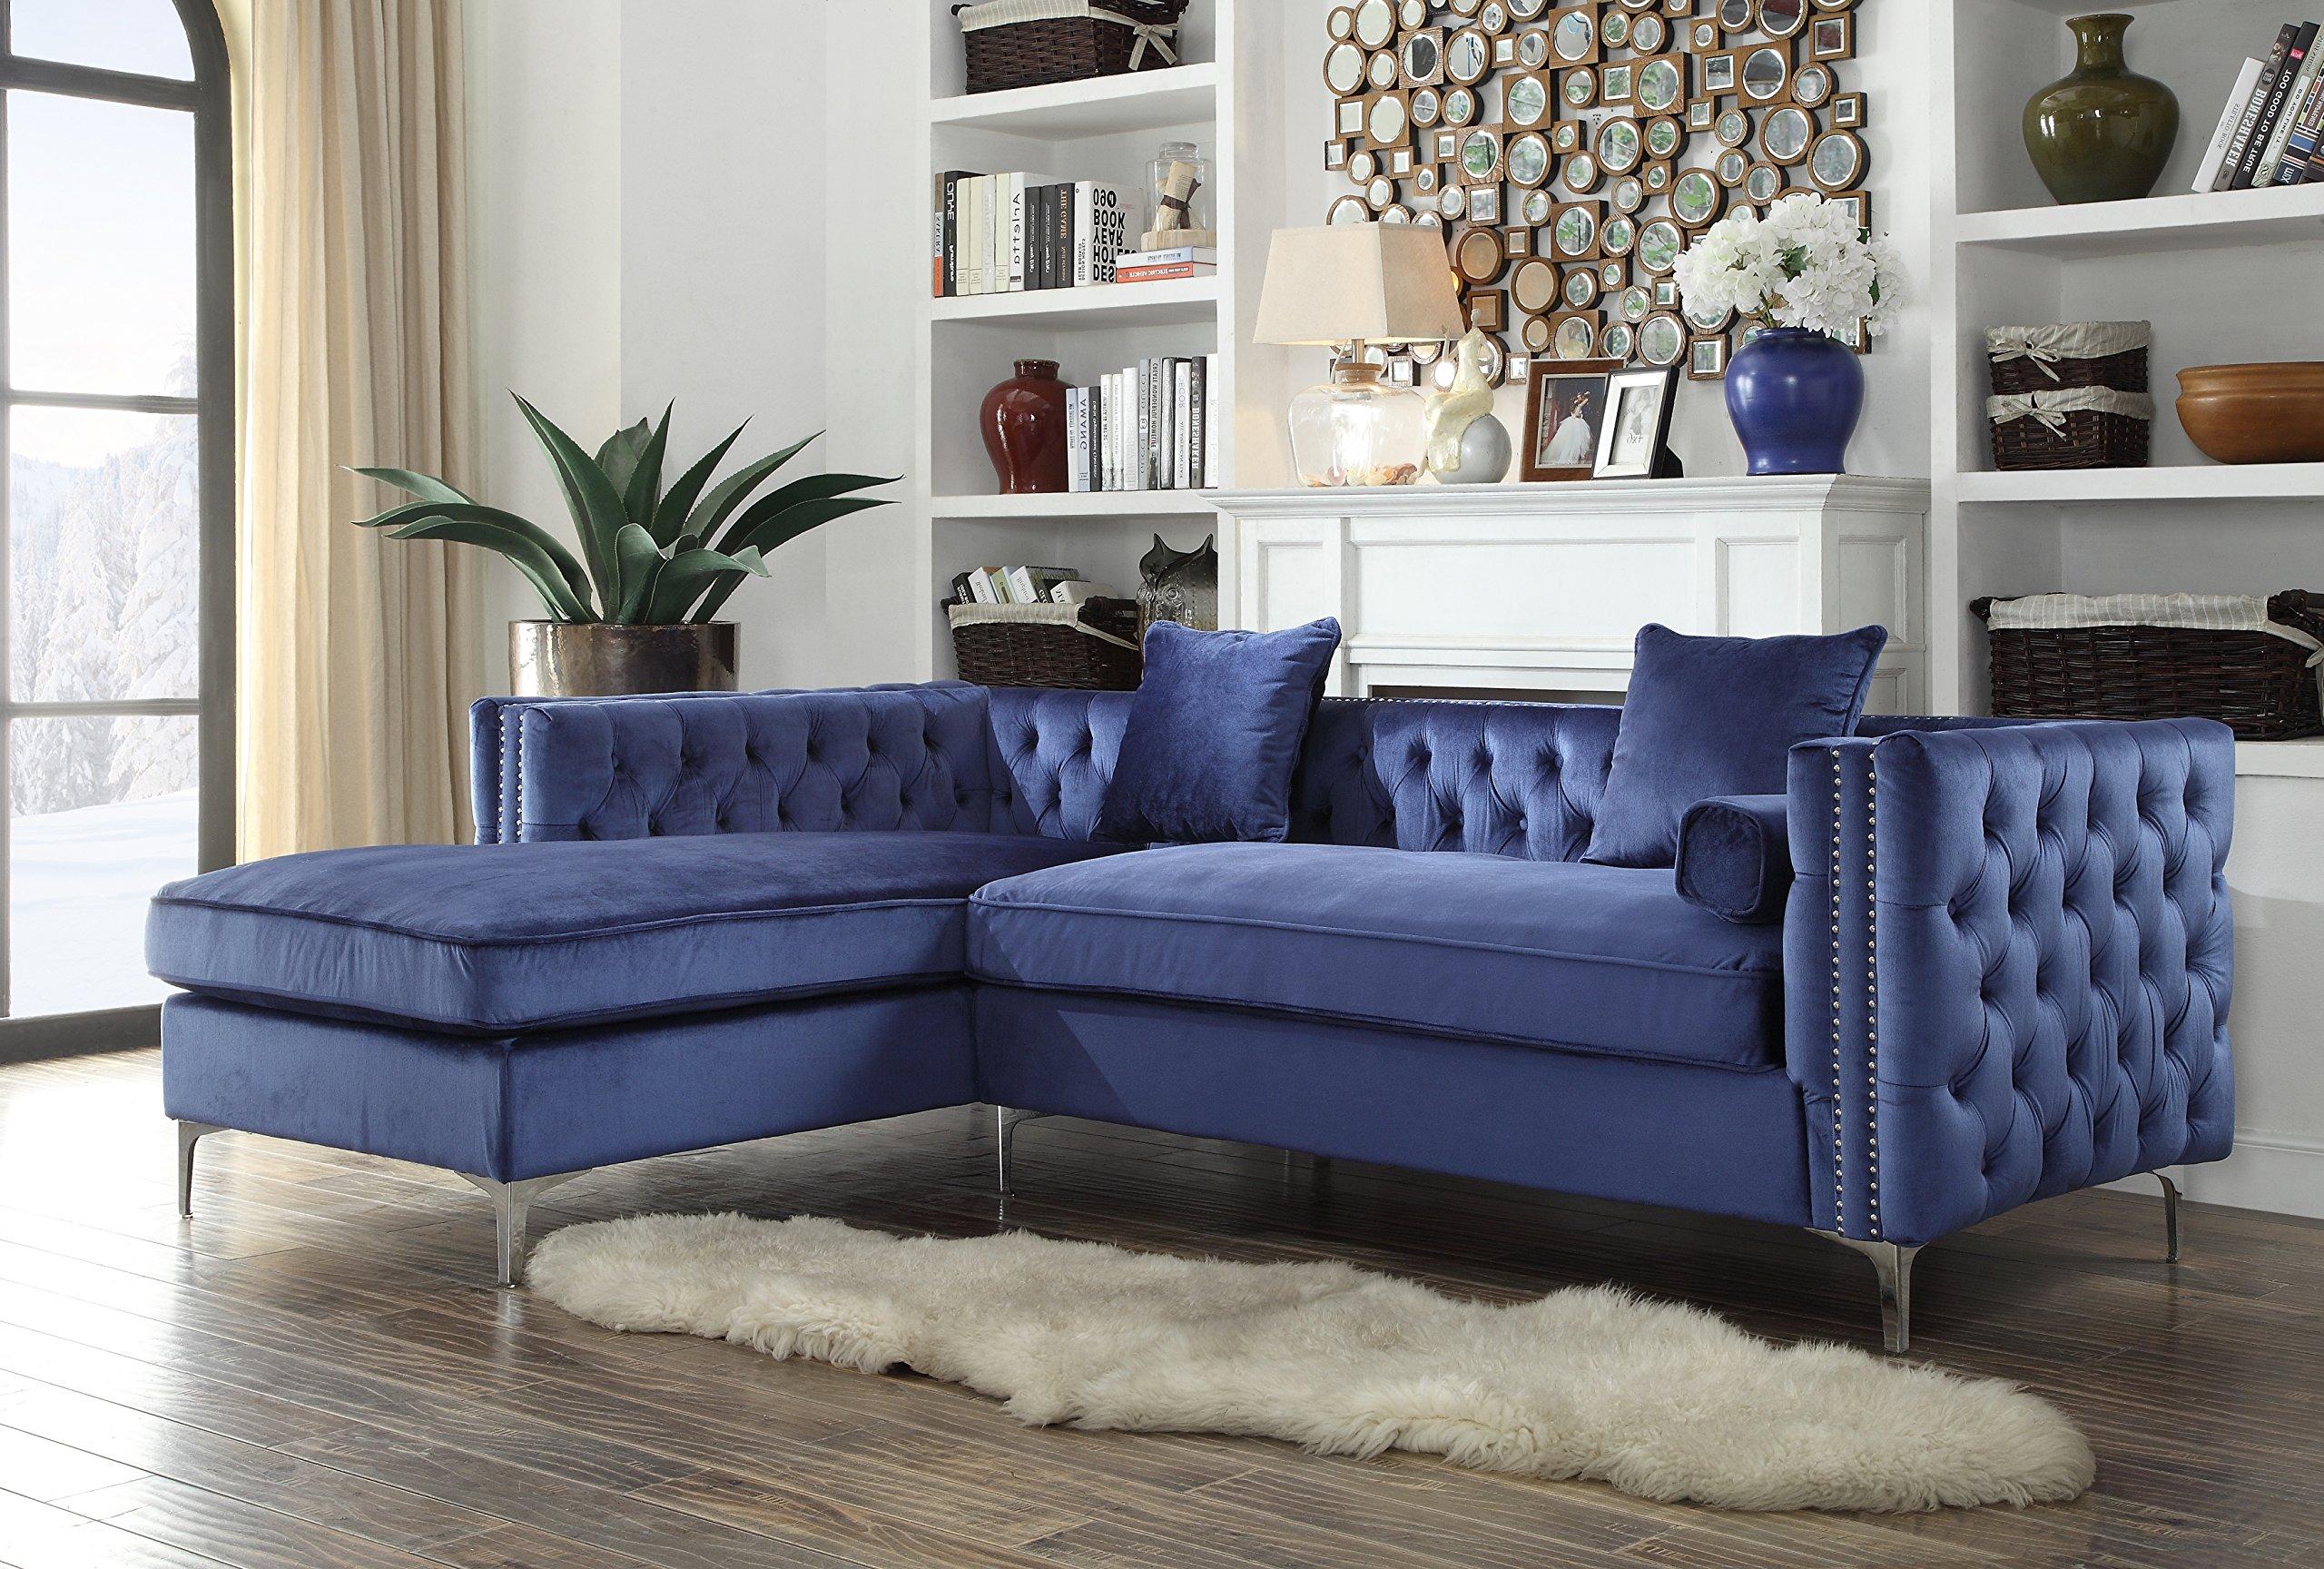 Iconic home da vinci tufted silver trim navy blue velvet left facing sectional sofa silver tone